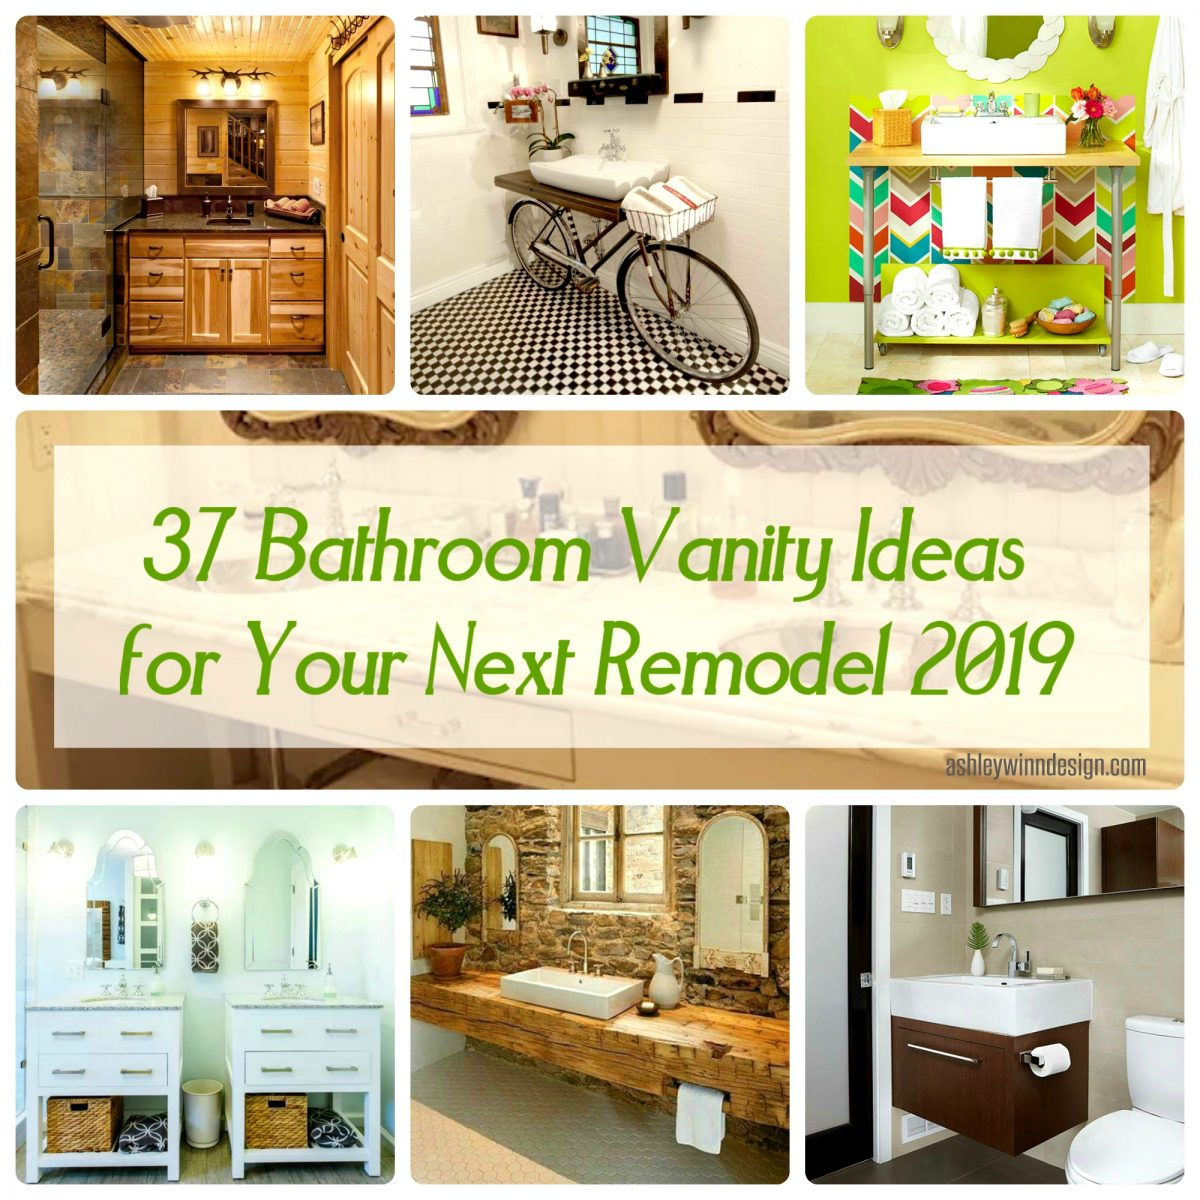 37 Bathroom Vanity Ideas For Your Next Remodel